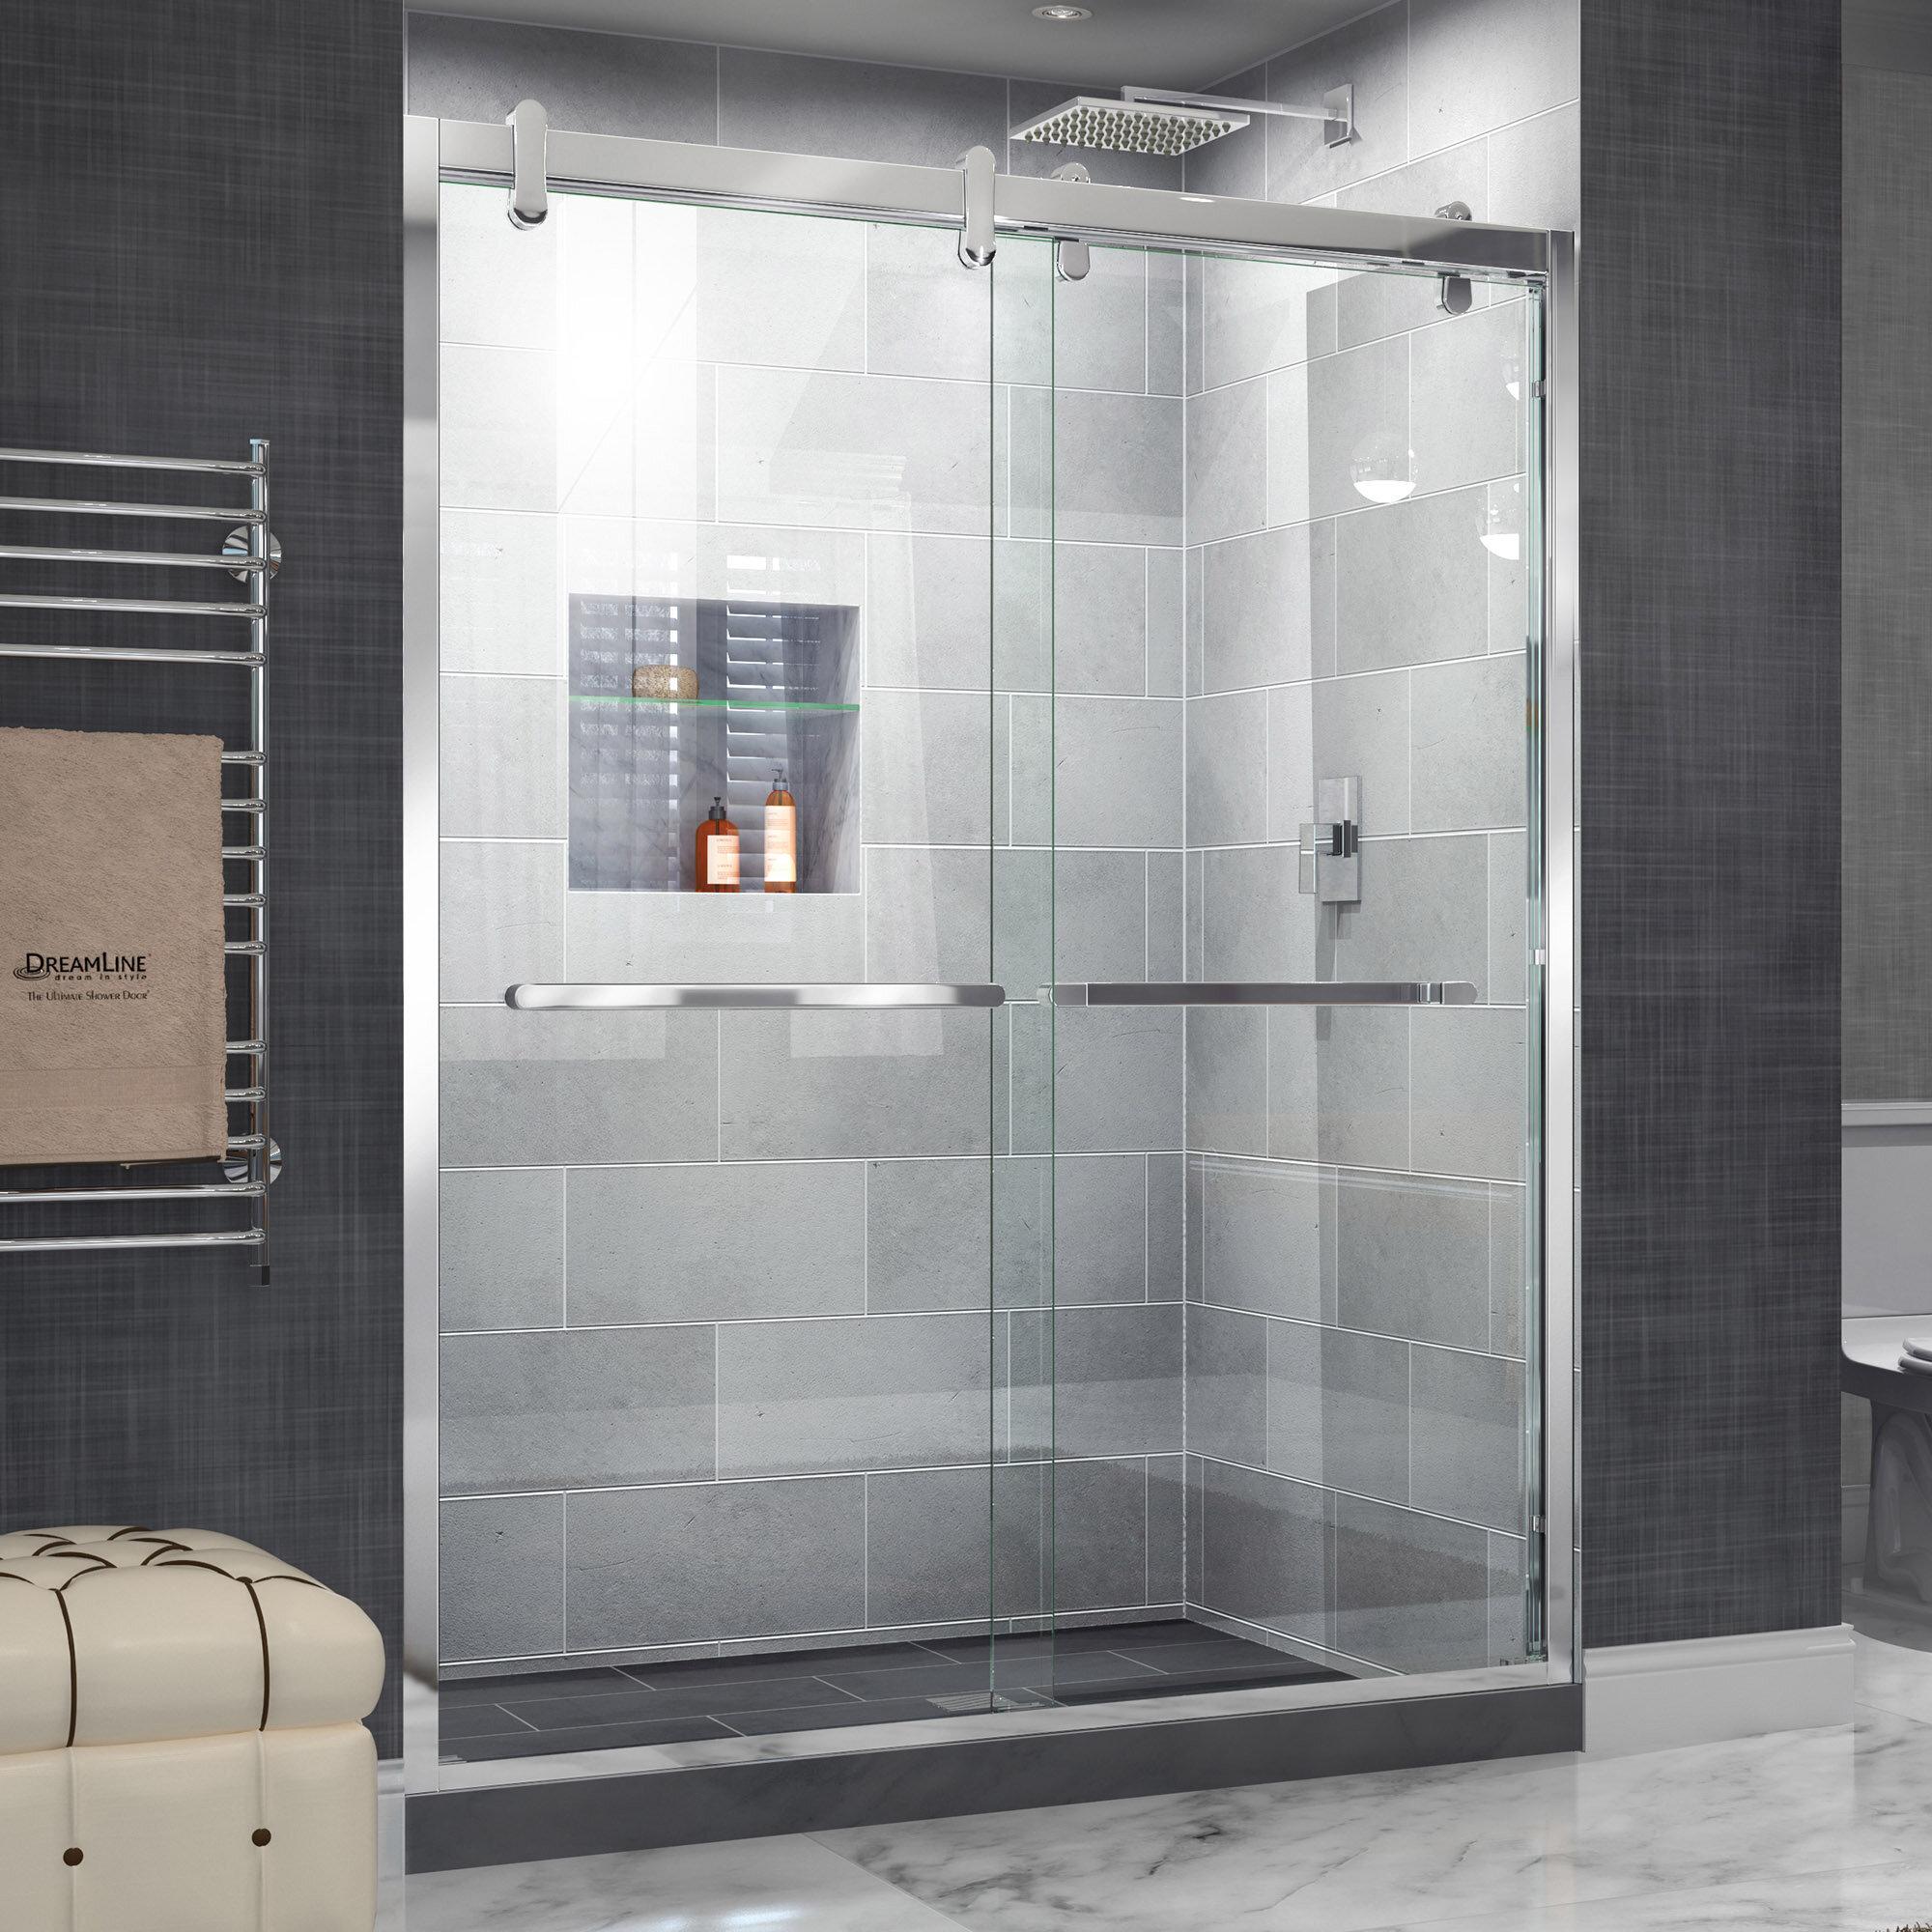 Dreamline Cavalier 60 X 7738 Bypass Semi Frameless Shower Door